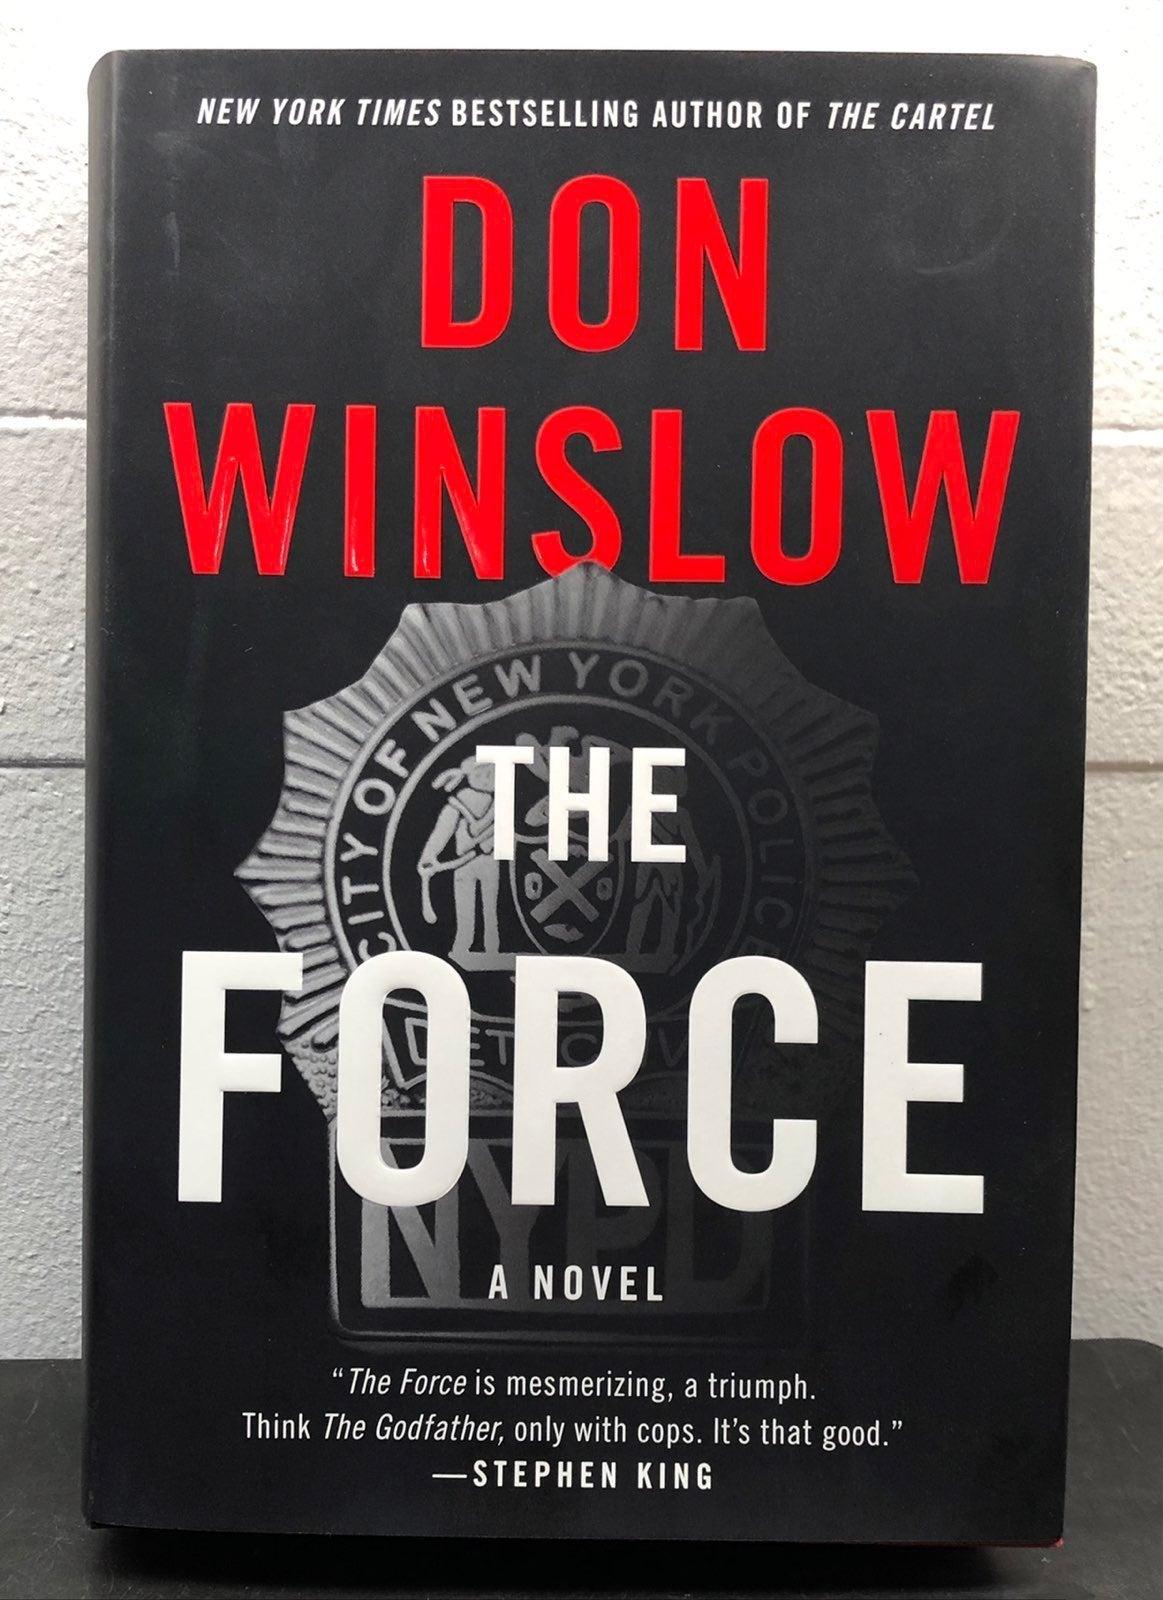 The force a novel